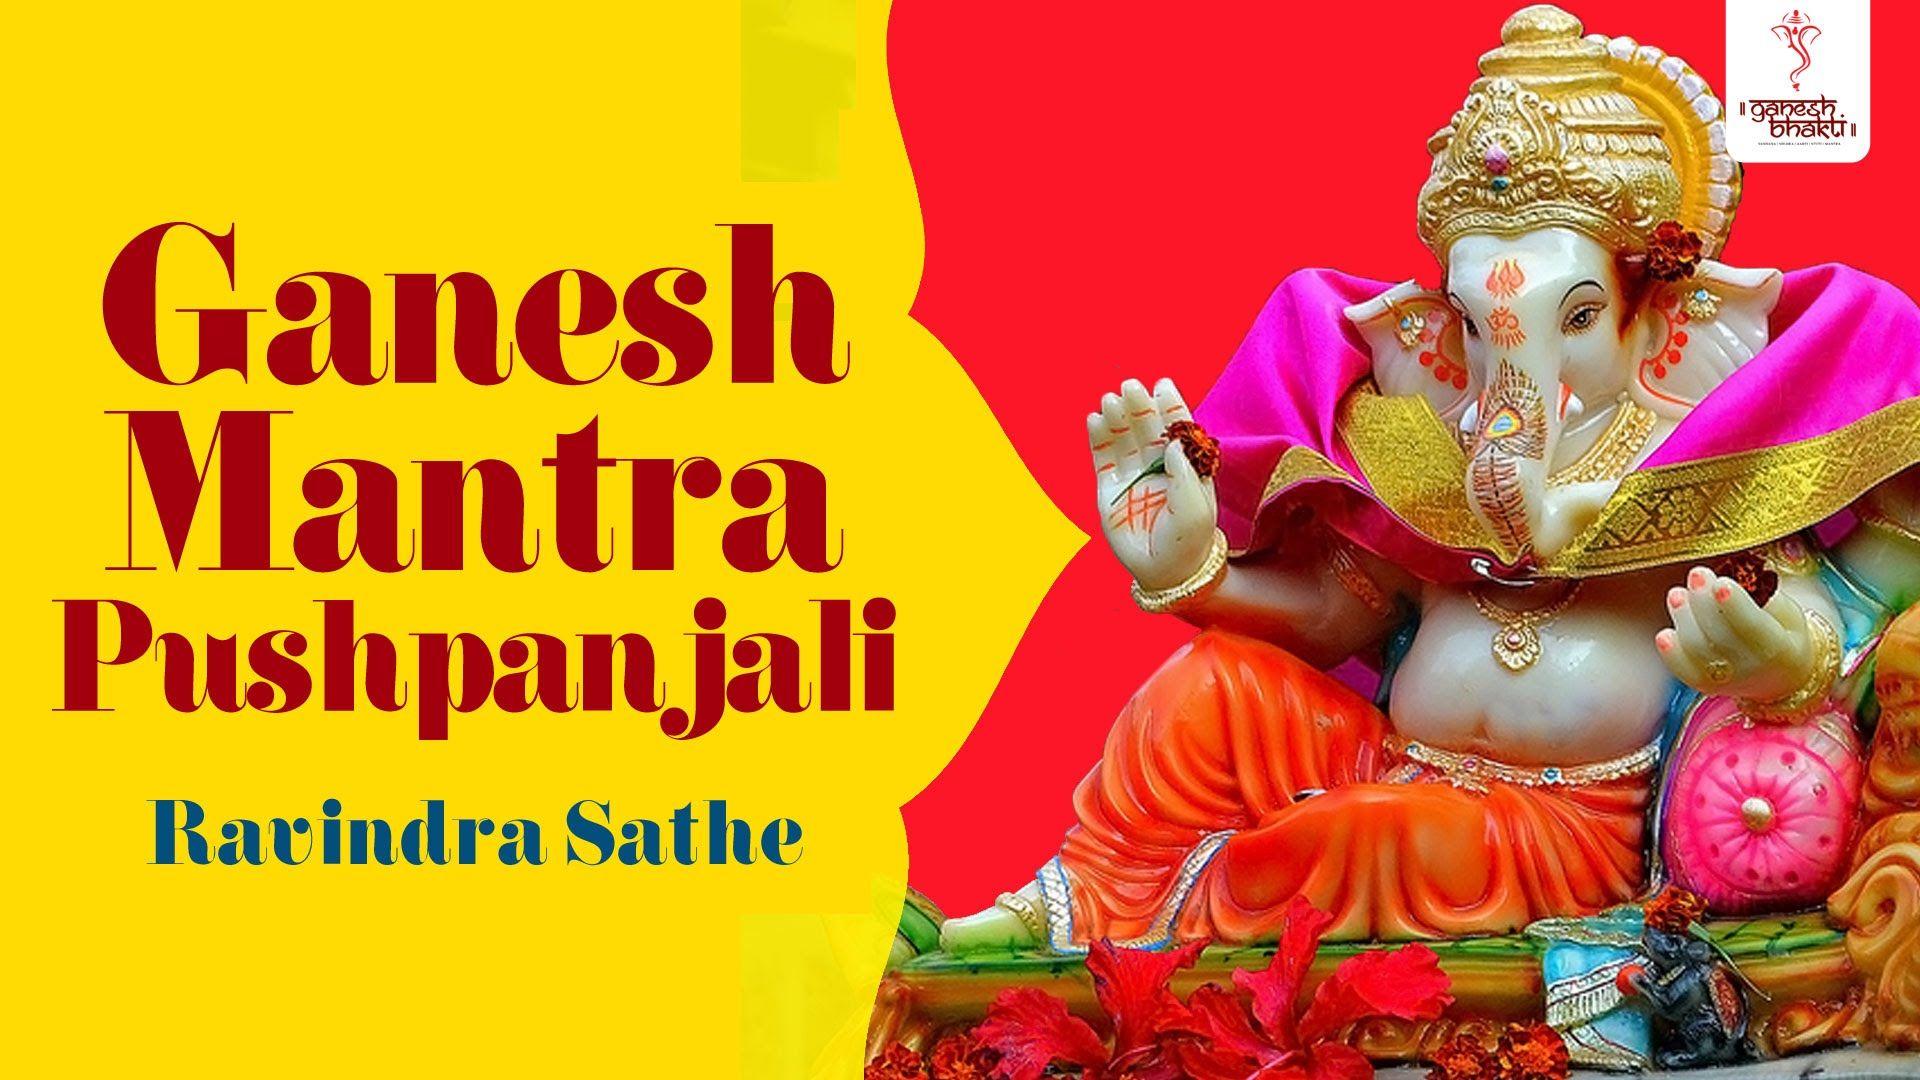 Mantra Pushpanjali shlok - Ganesh Mantra - Devotional Song    Stotra